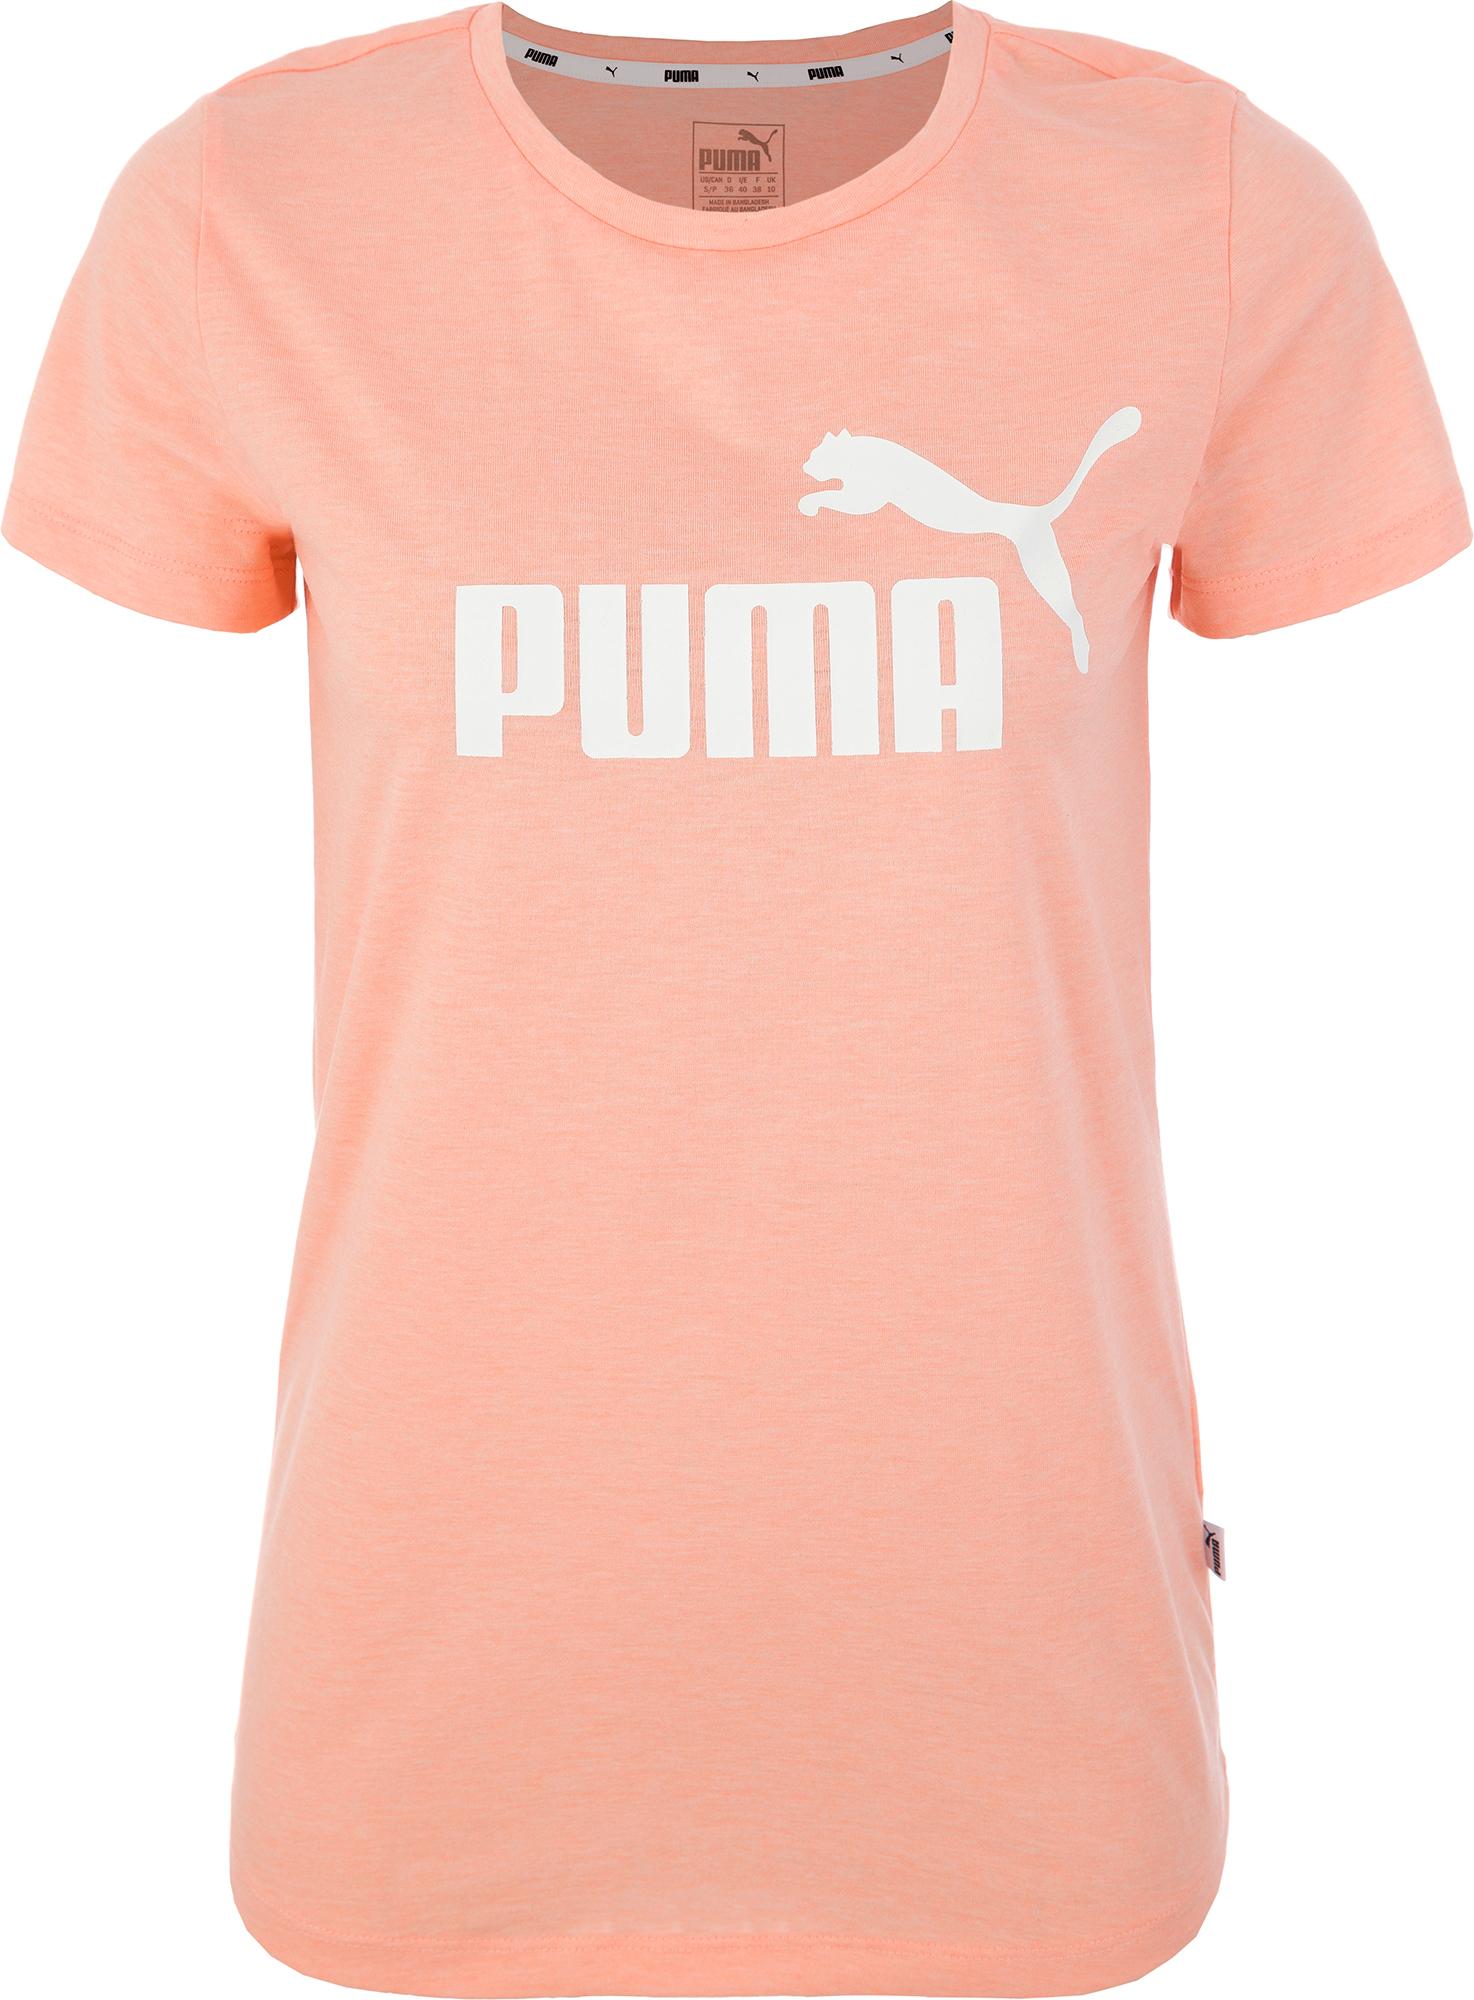 Puma Футболка женская Puma ESS+ Logo Heather Tee, размер 48-50 футболка женская puma evo tee цвет персиковый 57511231 размер m 44 46